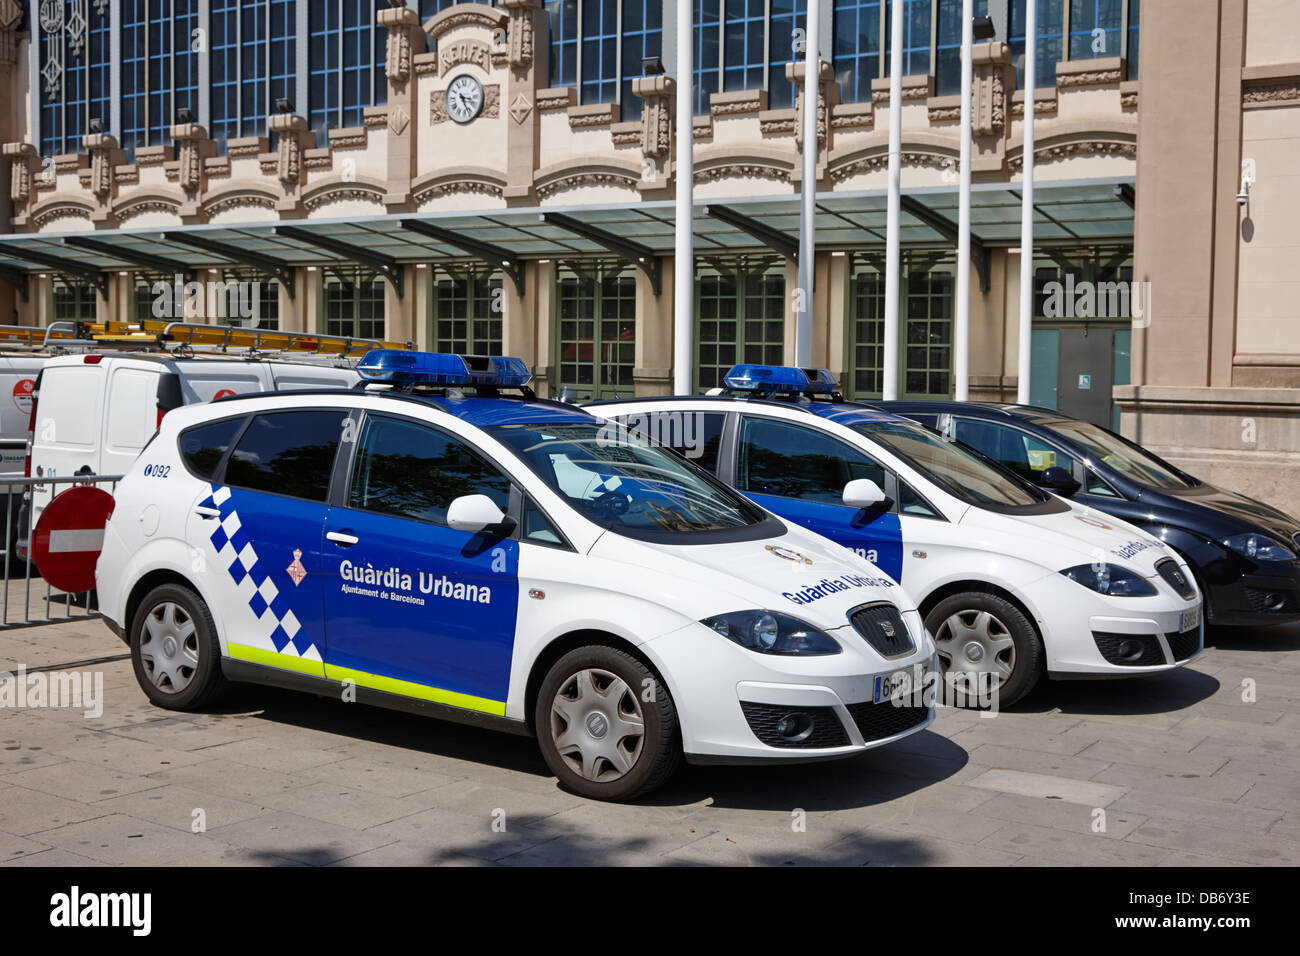 policia guardia urbana patrol cars outside estacio del nord station Barcelona Catalonia Spain - Stock Image